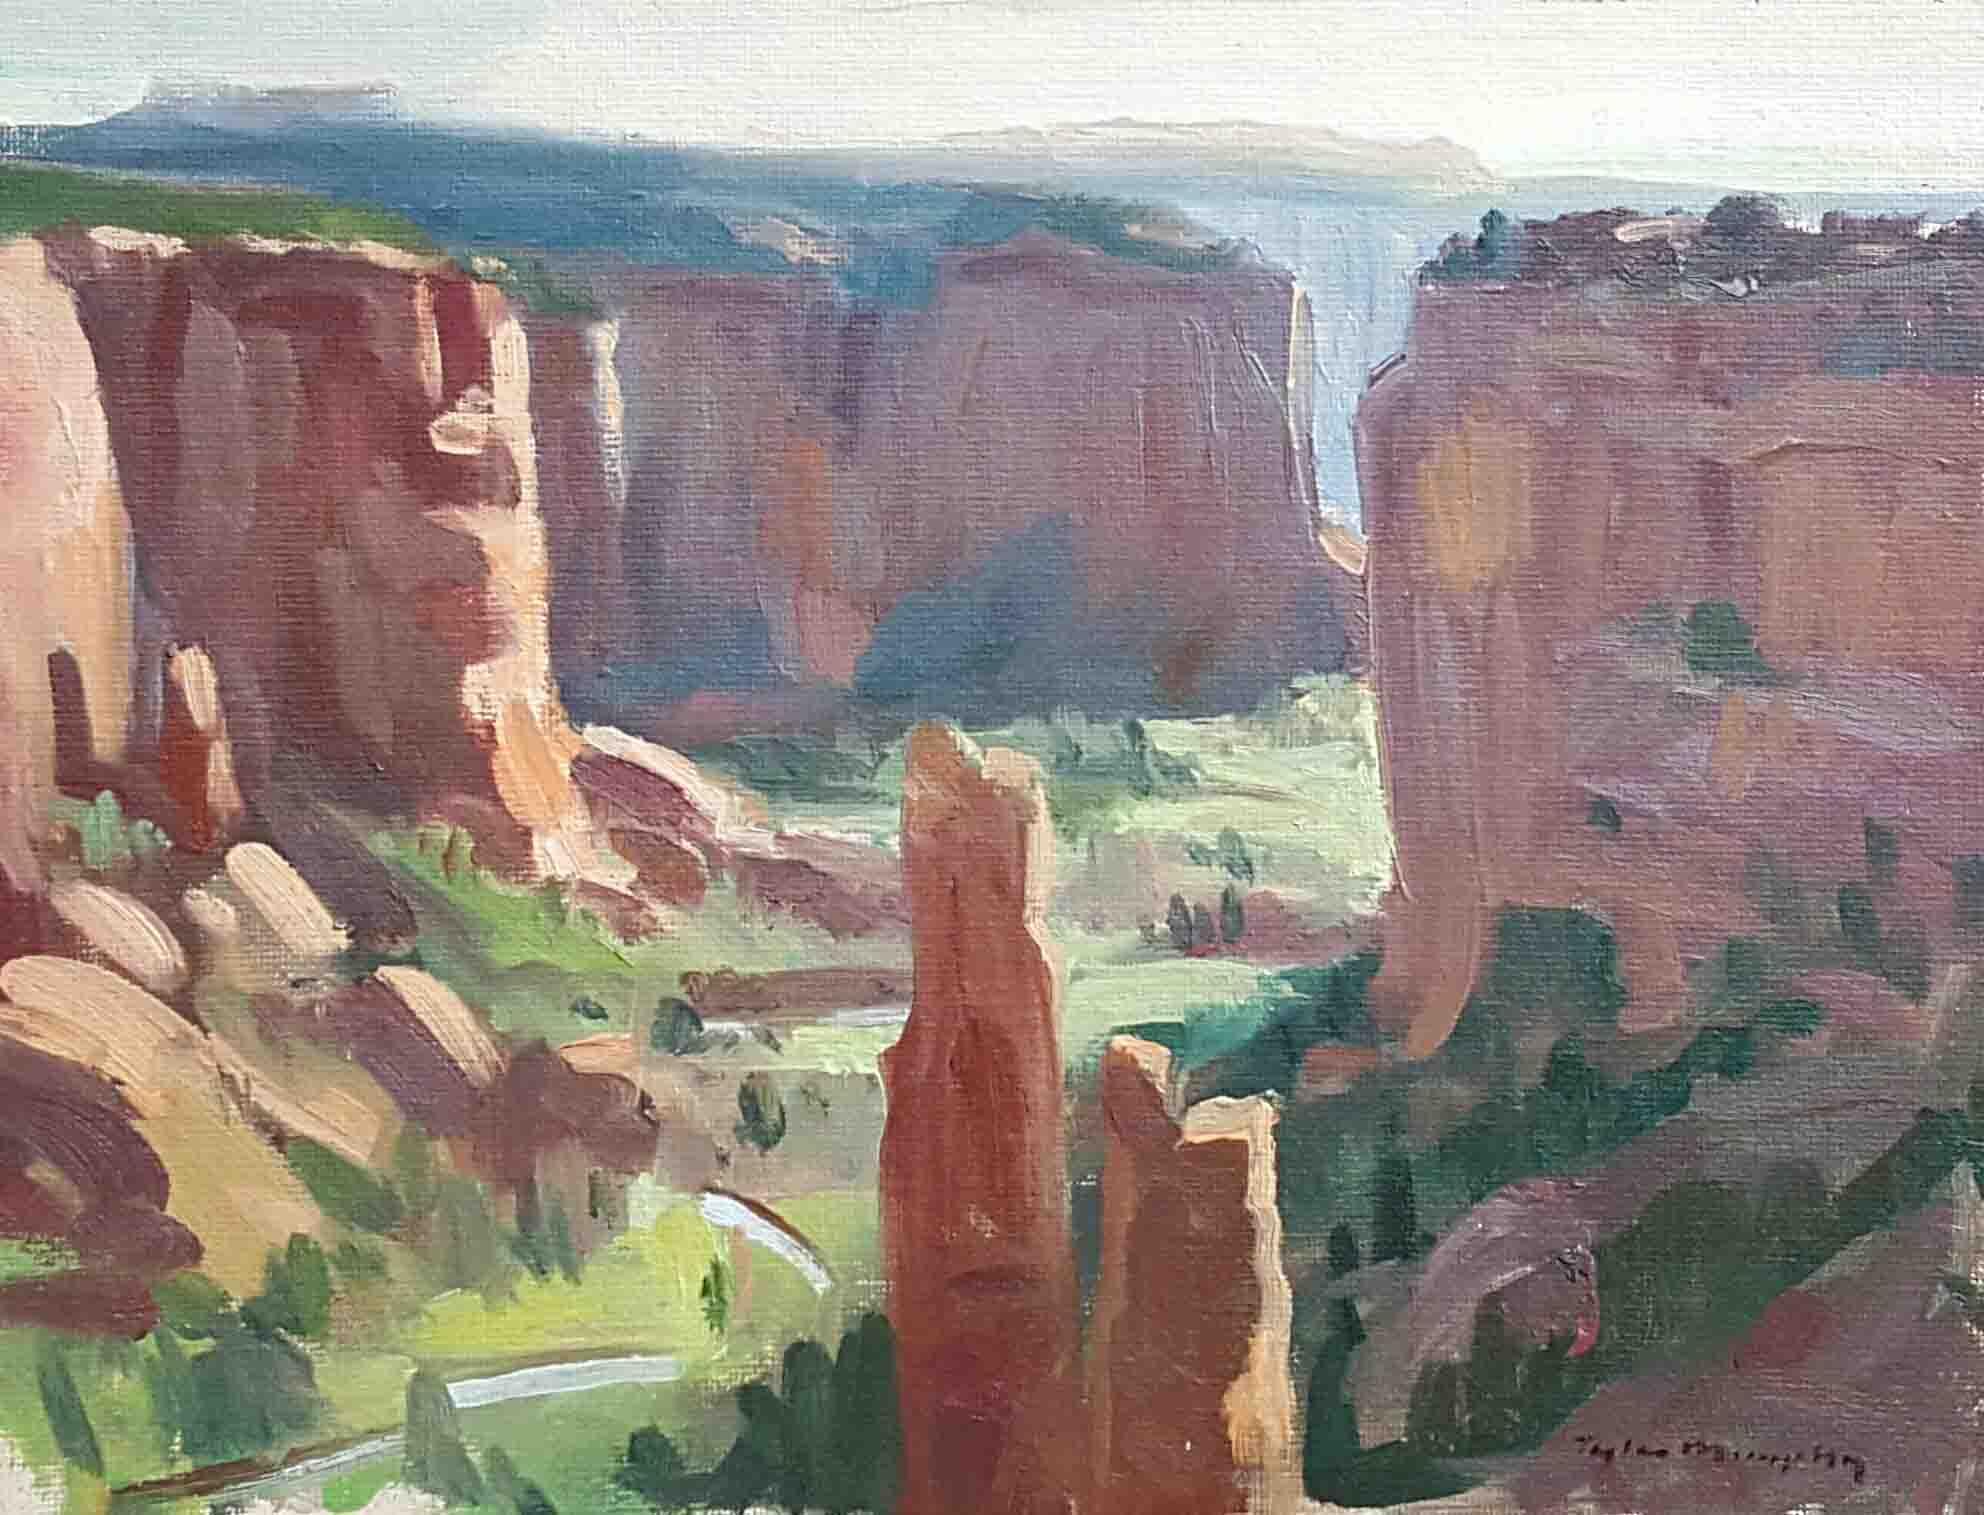 Morning at Canyon De Chelly 9x12.jpg